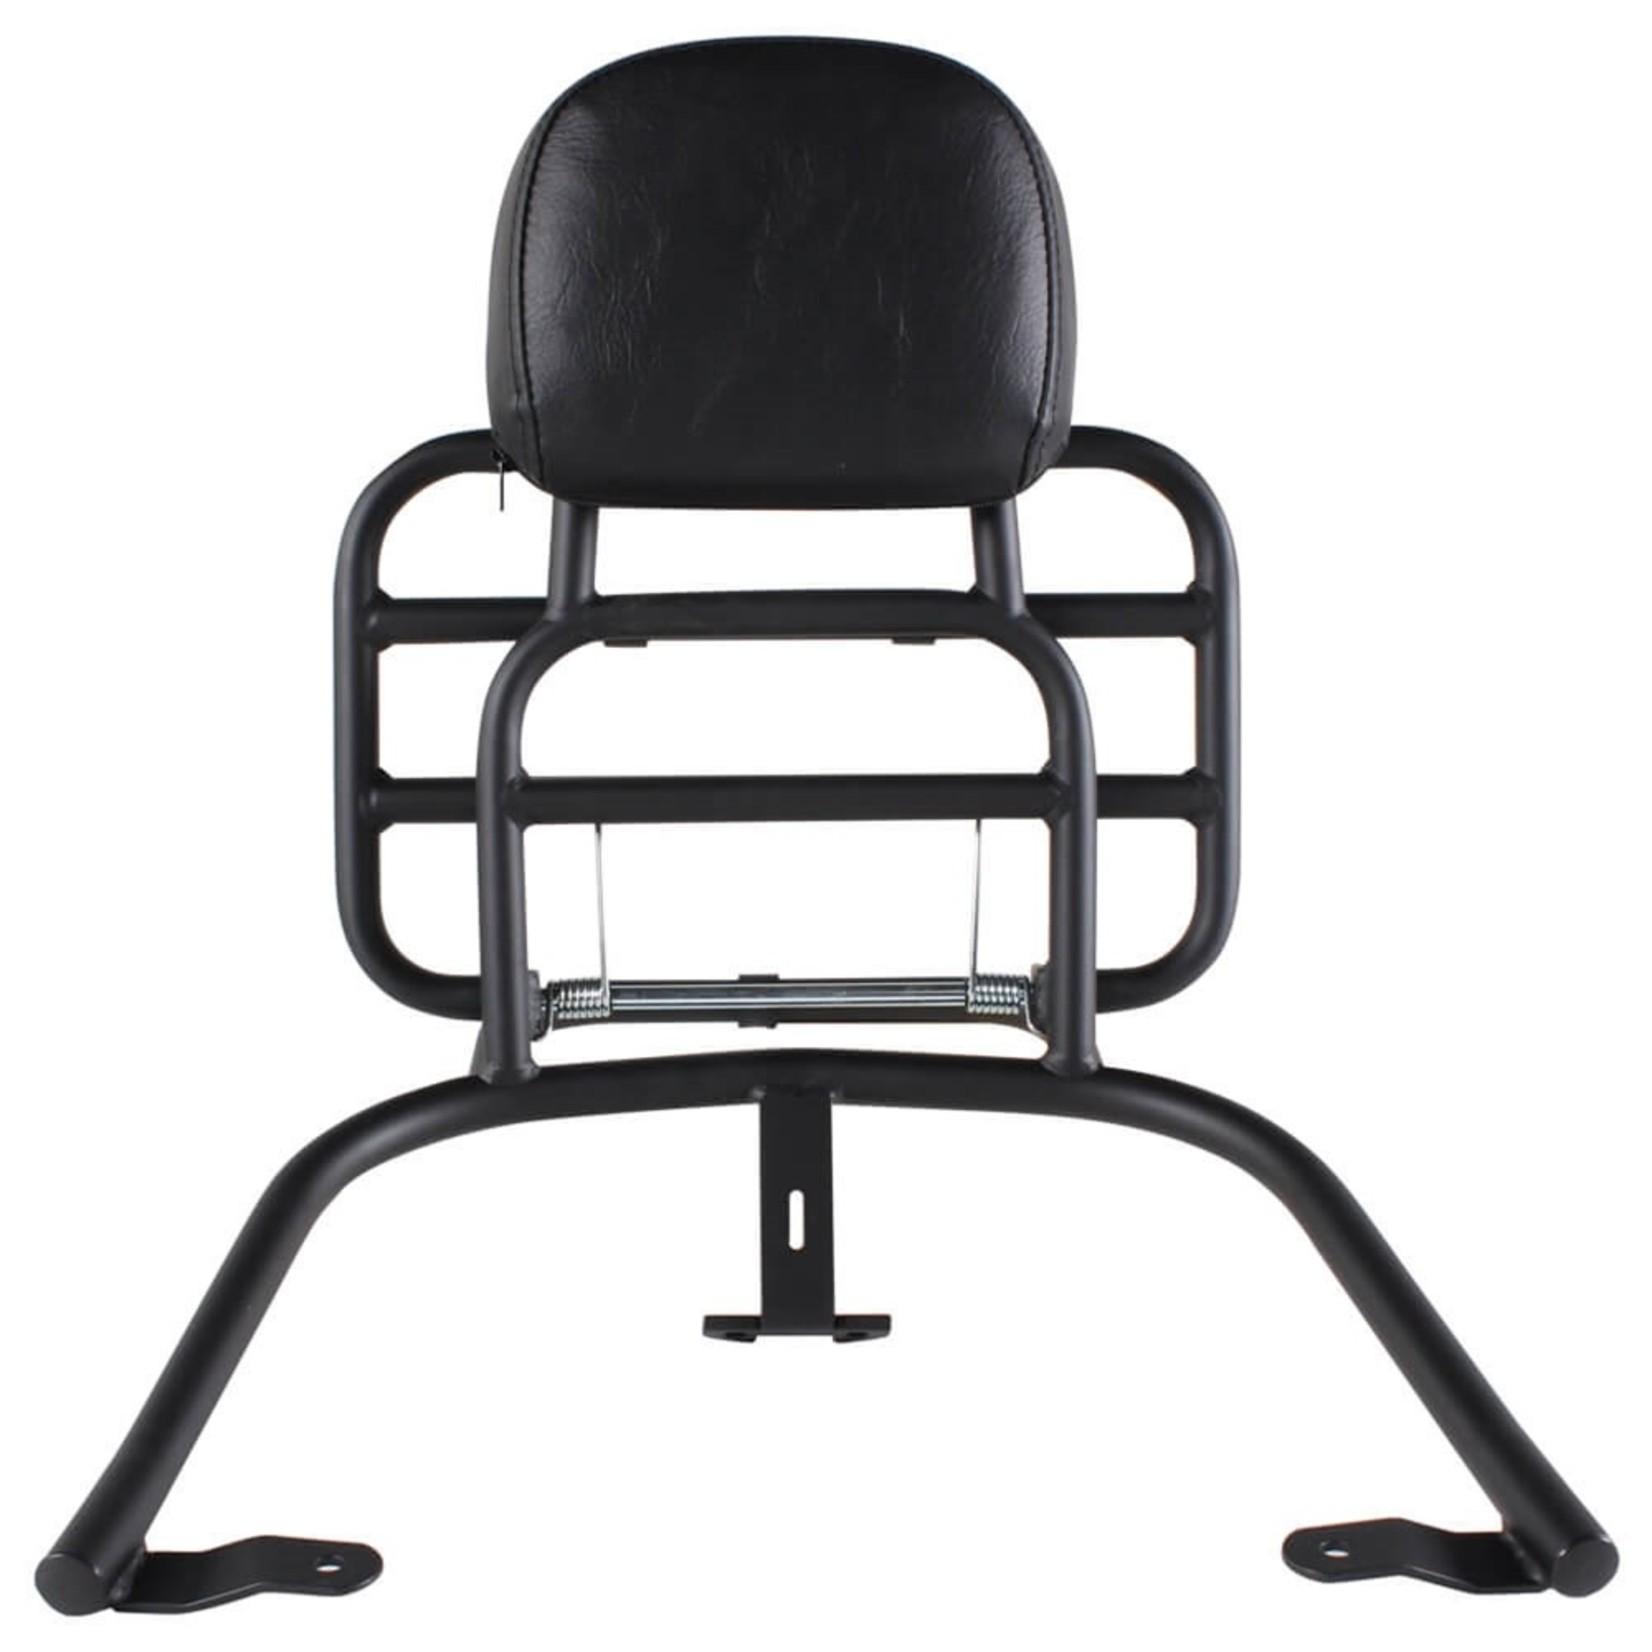 Accessories Rack, Vespa Primavera/Sprint Rear Black w/Backrest